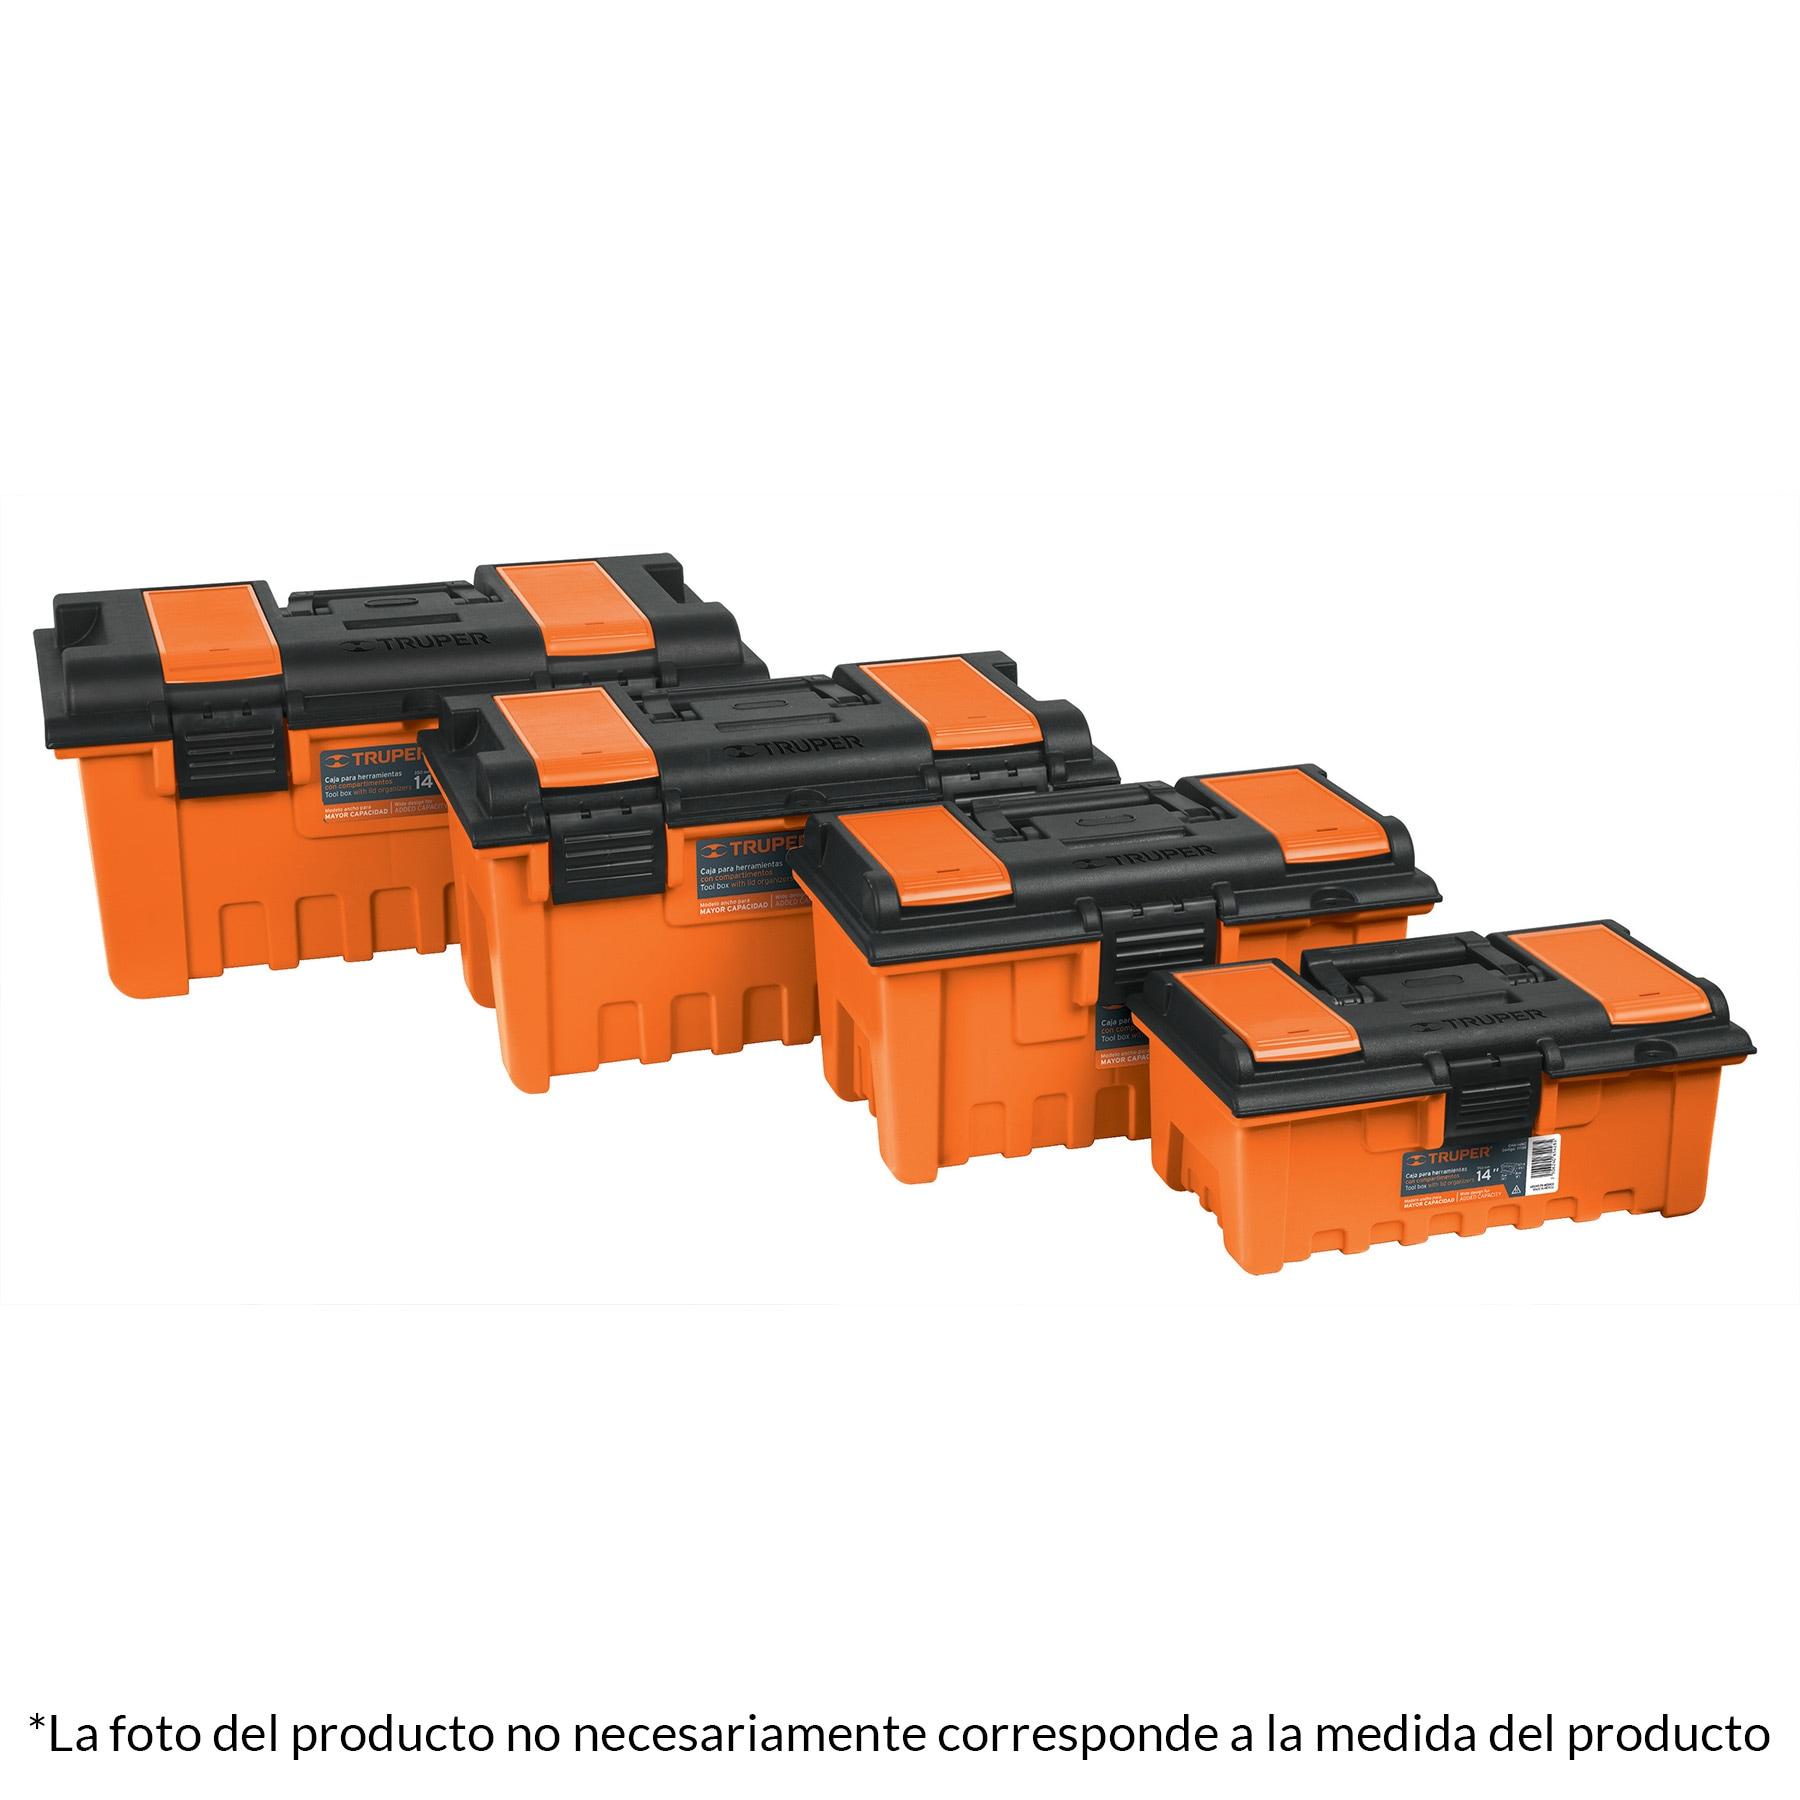 Caja plástica 16' con compartimentos, naranja